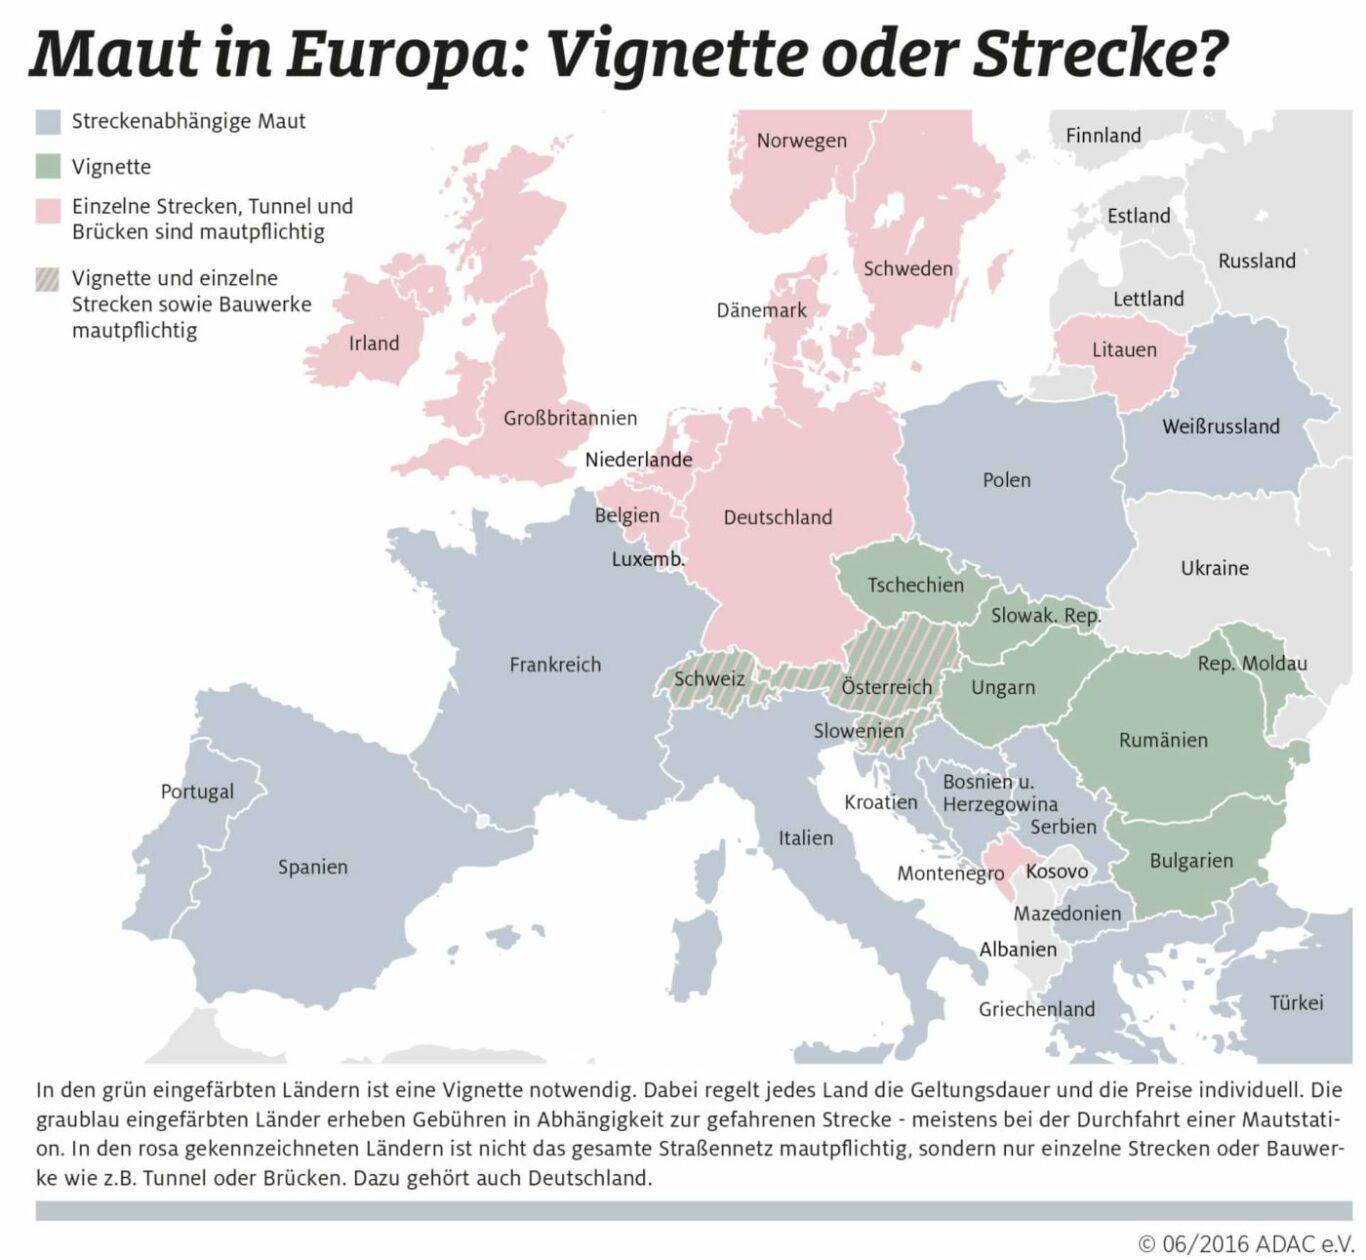 Mautländer in Europa